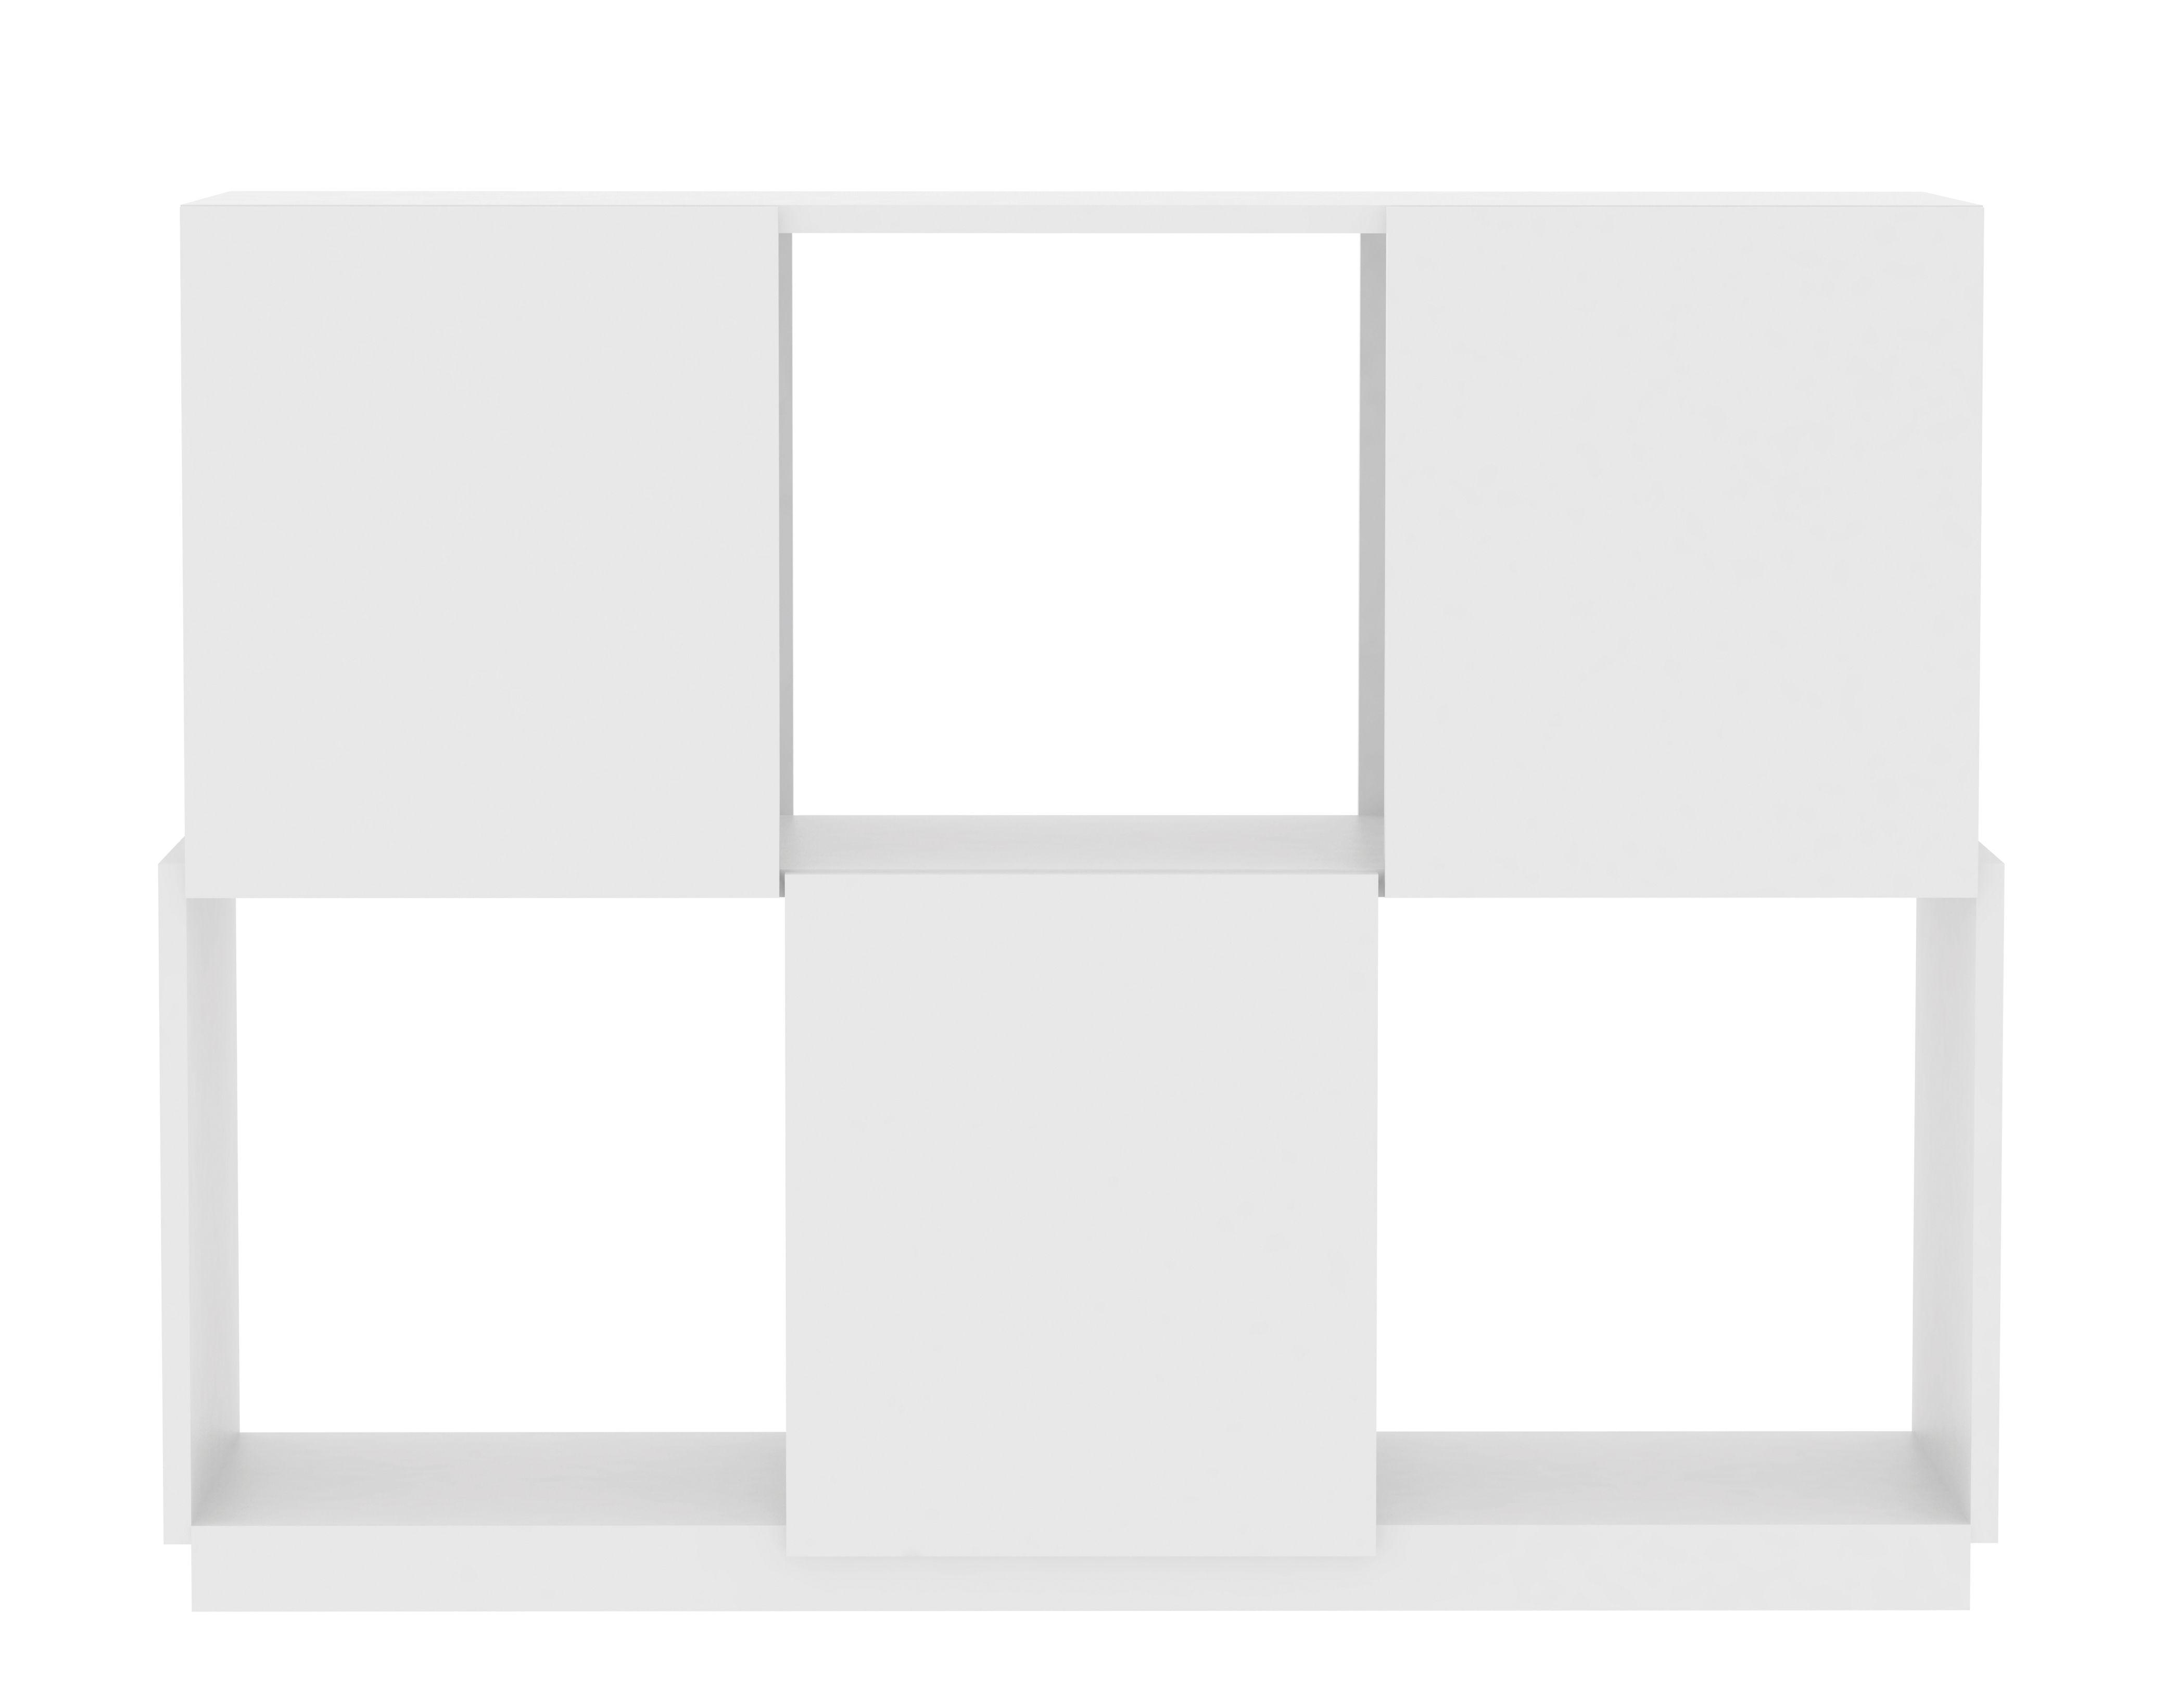 Furniture - Bookcases & Bookshelves - Cubic Shelf - L 105 x H 81 cm by POP UP HOME - White - Honeycomb panels, Melamine